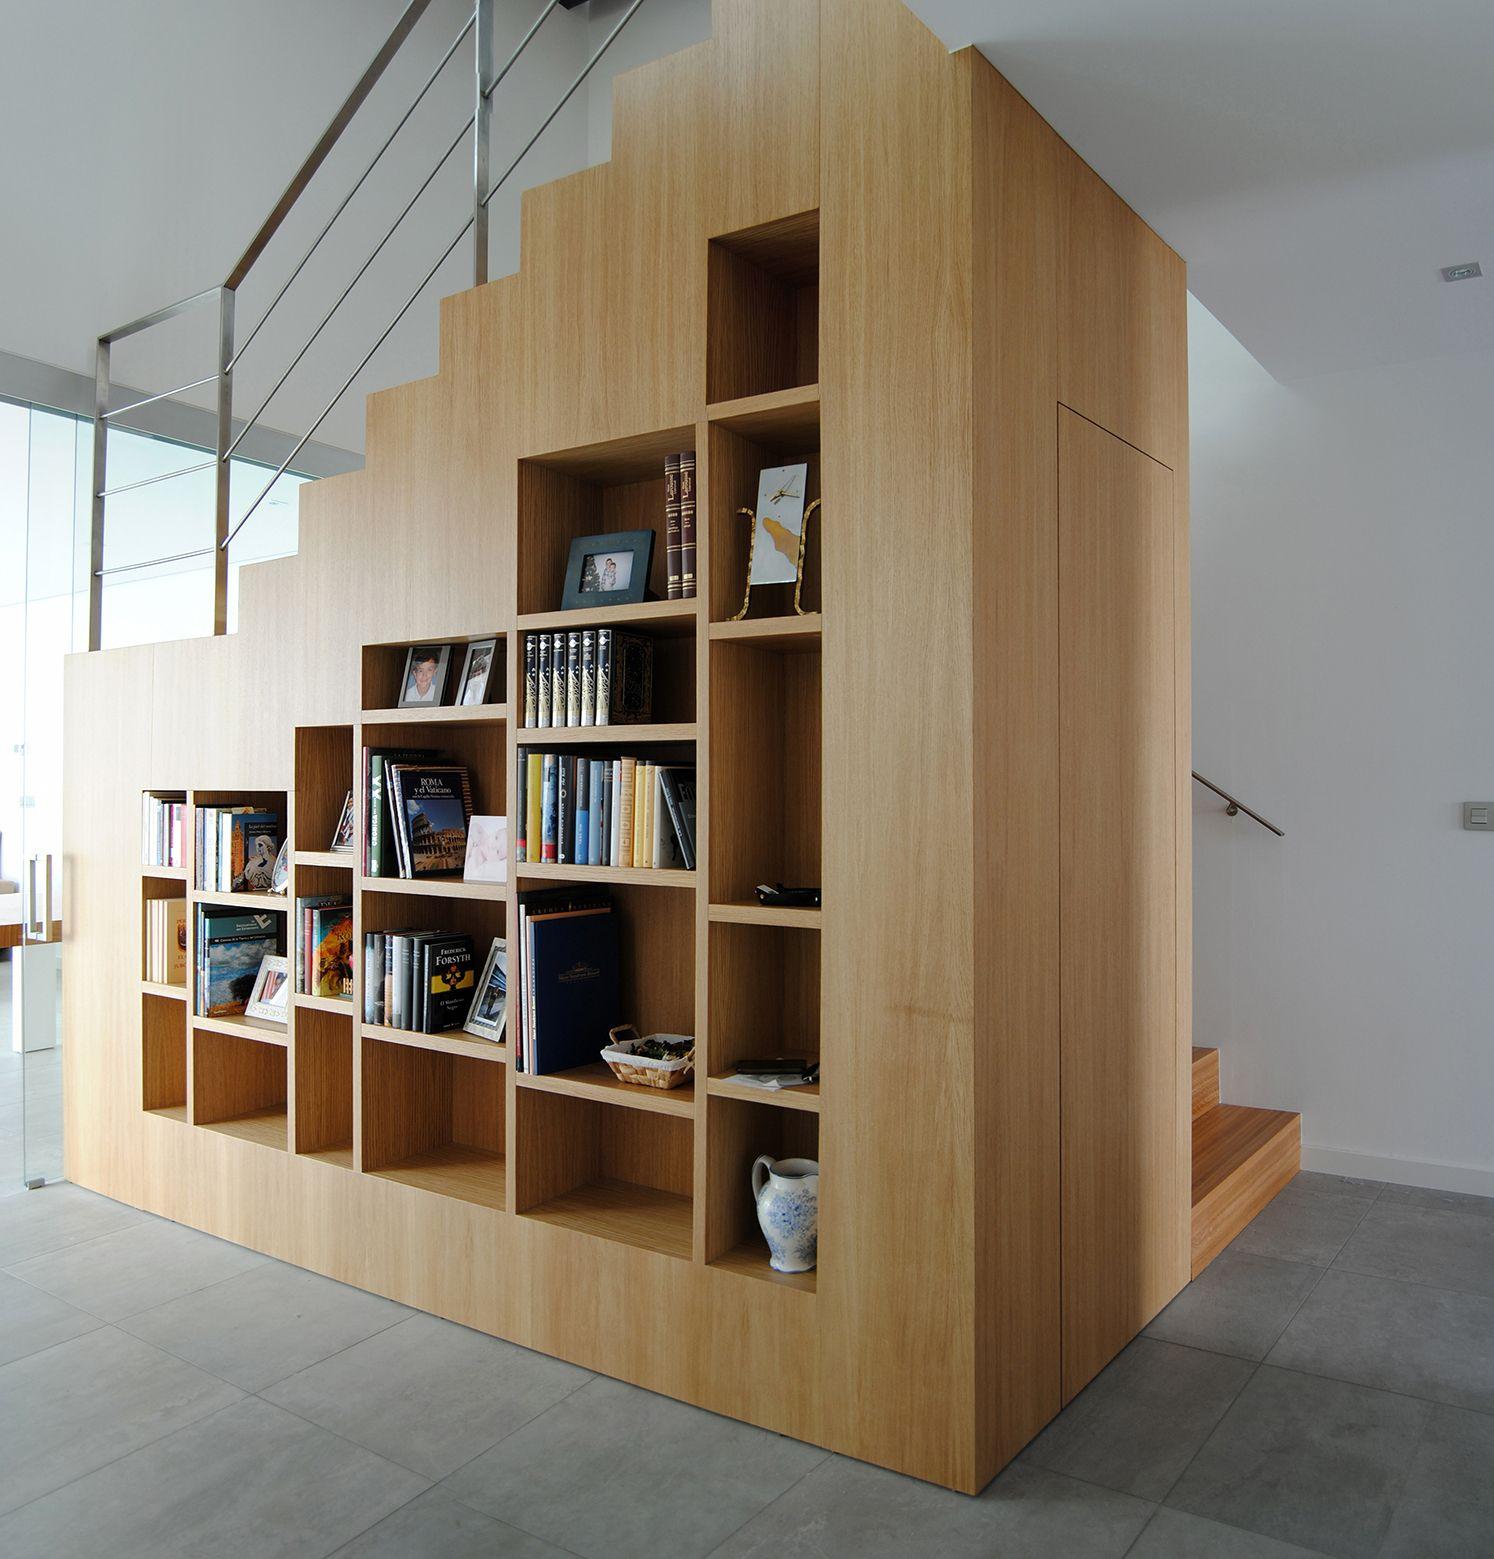 Vivienda Unifamiliar En Almansa Mbvb Arquitectos